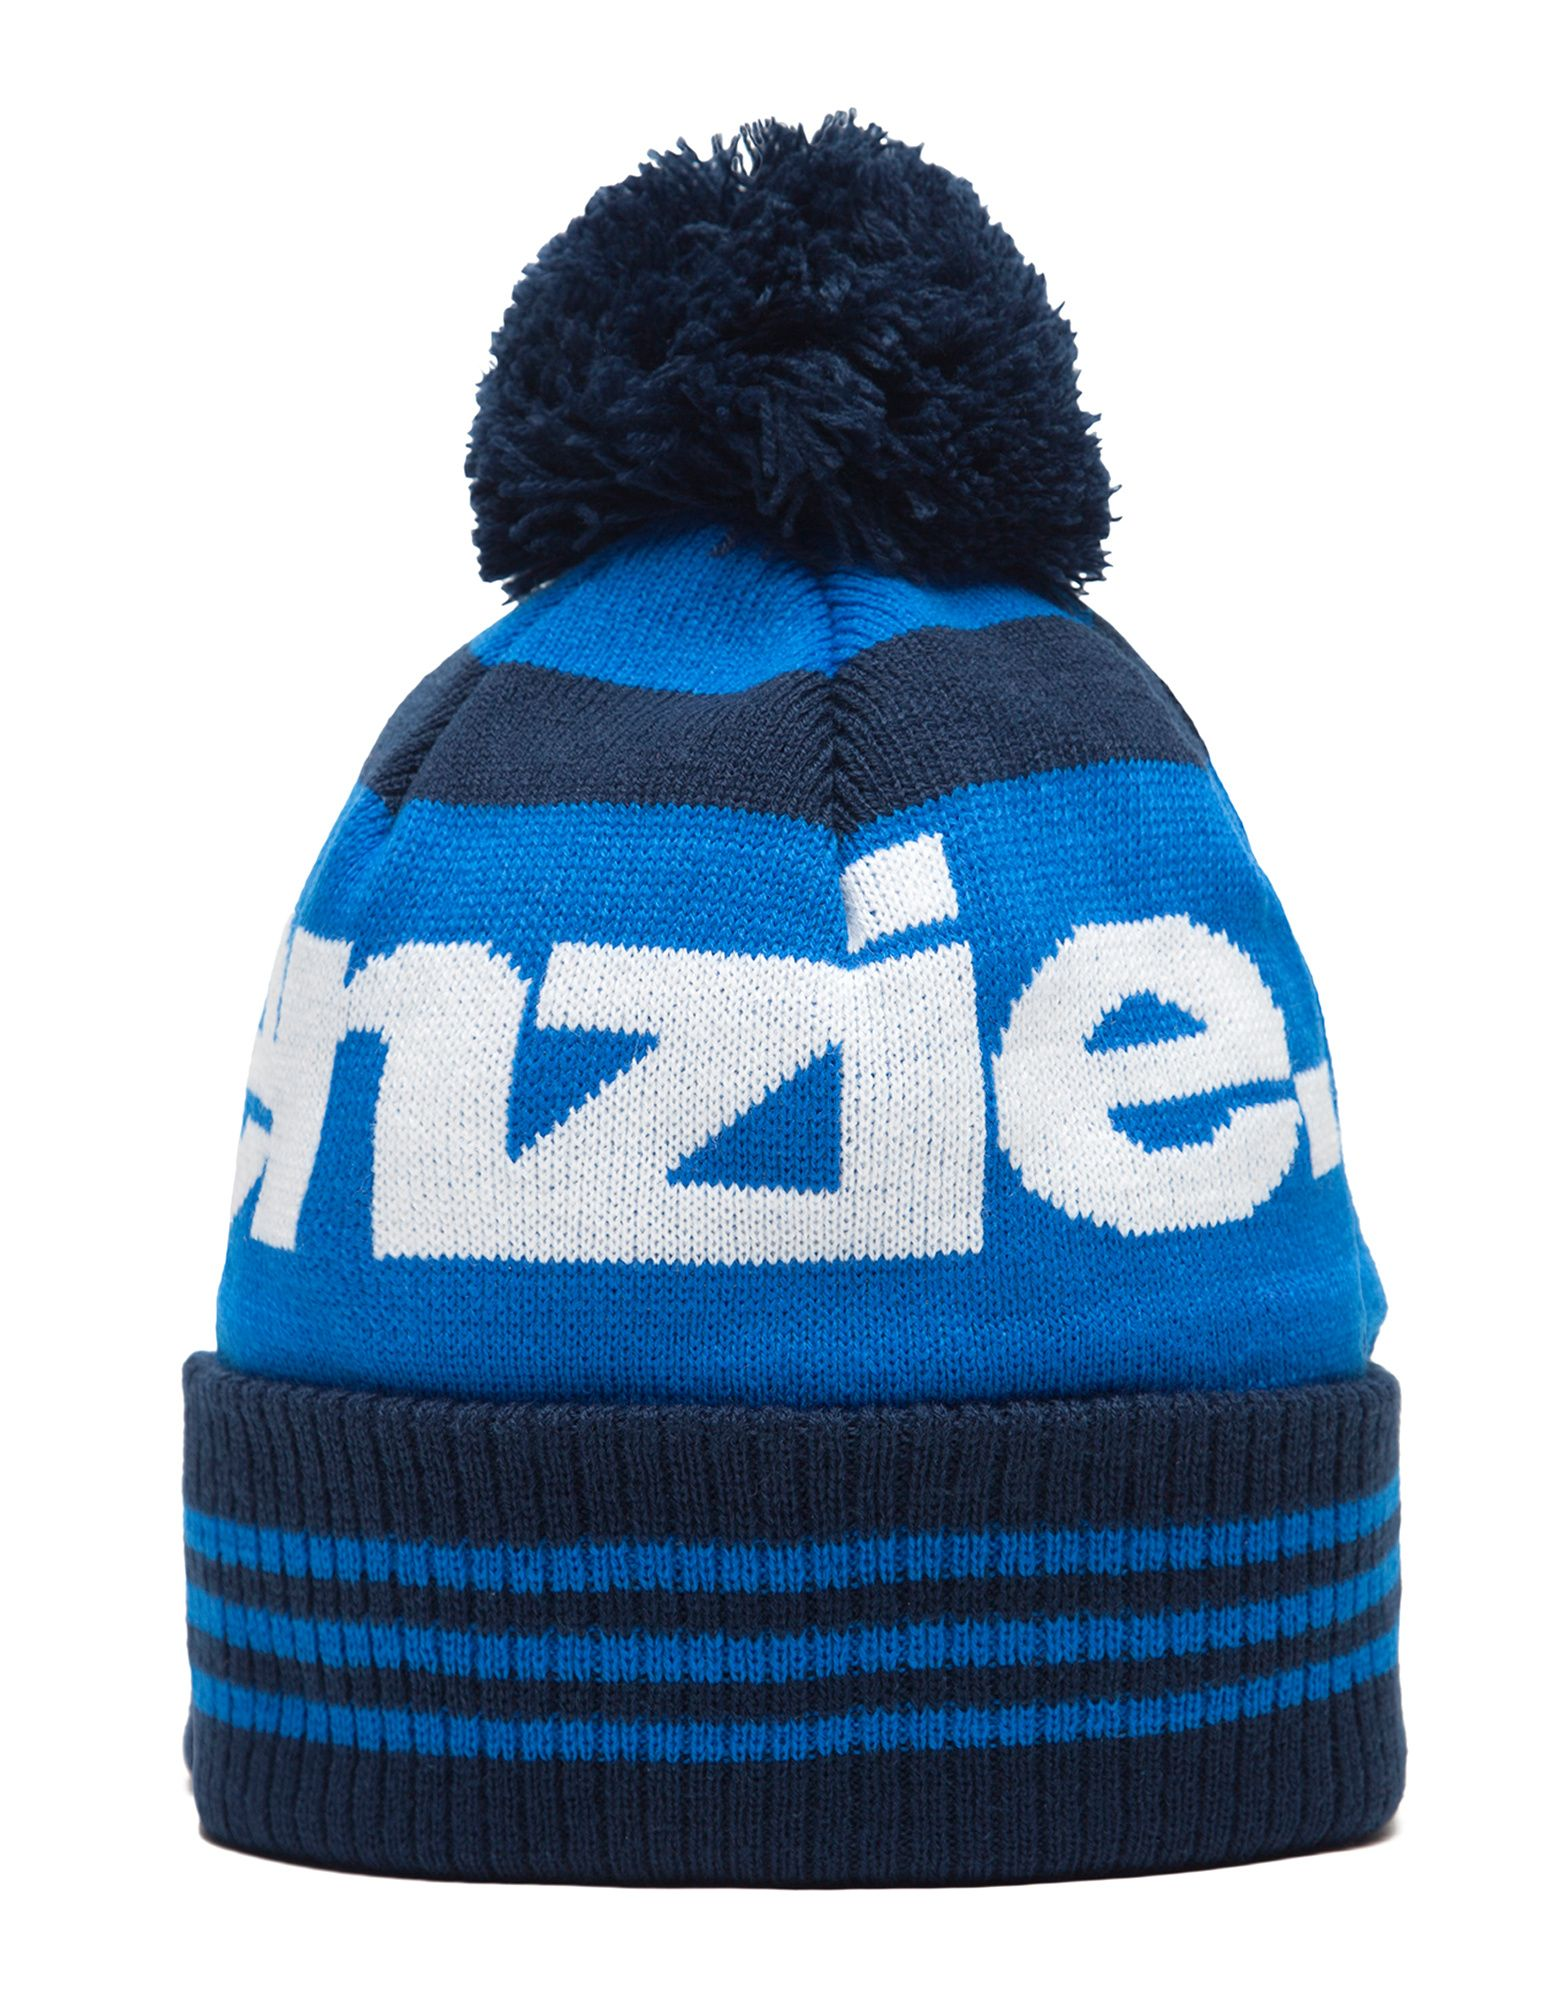 McKenzie Heat Bobble Hat